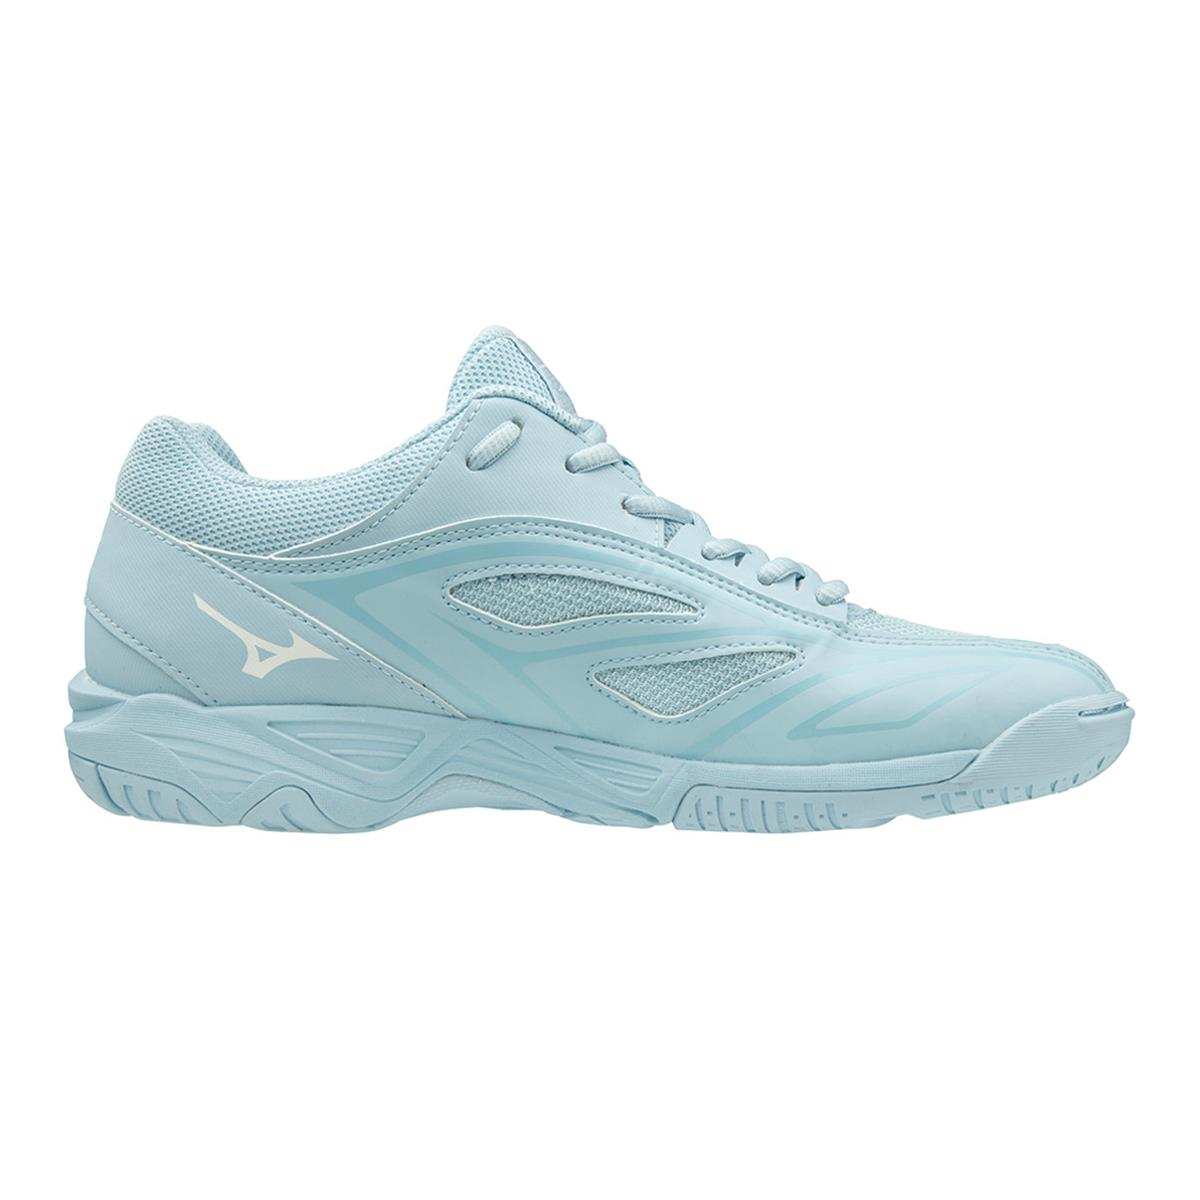 bien style de mode En liquidation Mizuno Mirage Star 2 Junior Court Shoes (Cool Blue-White-Angel Falls) |  Direct Badminton